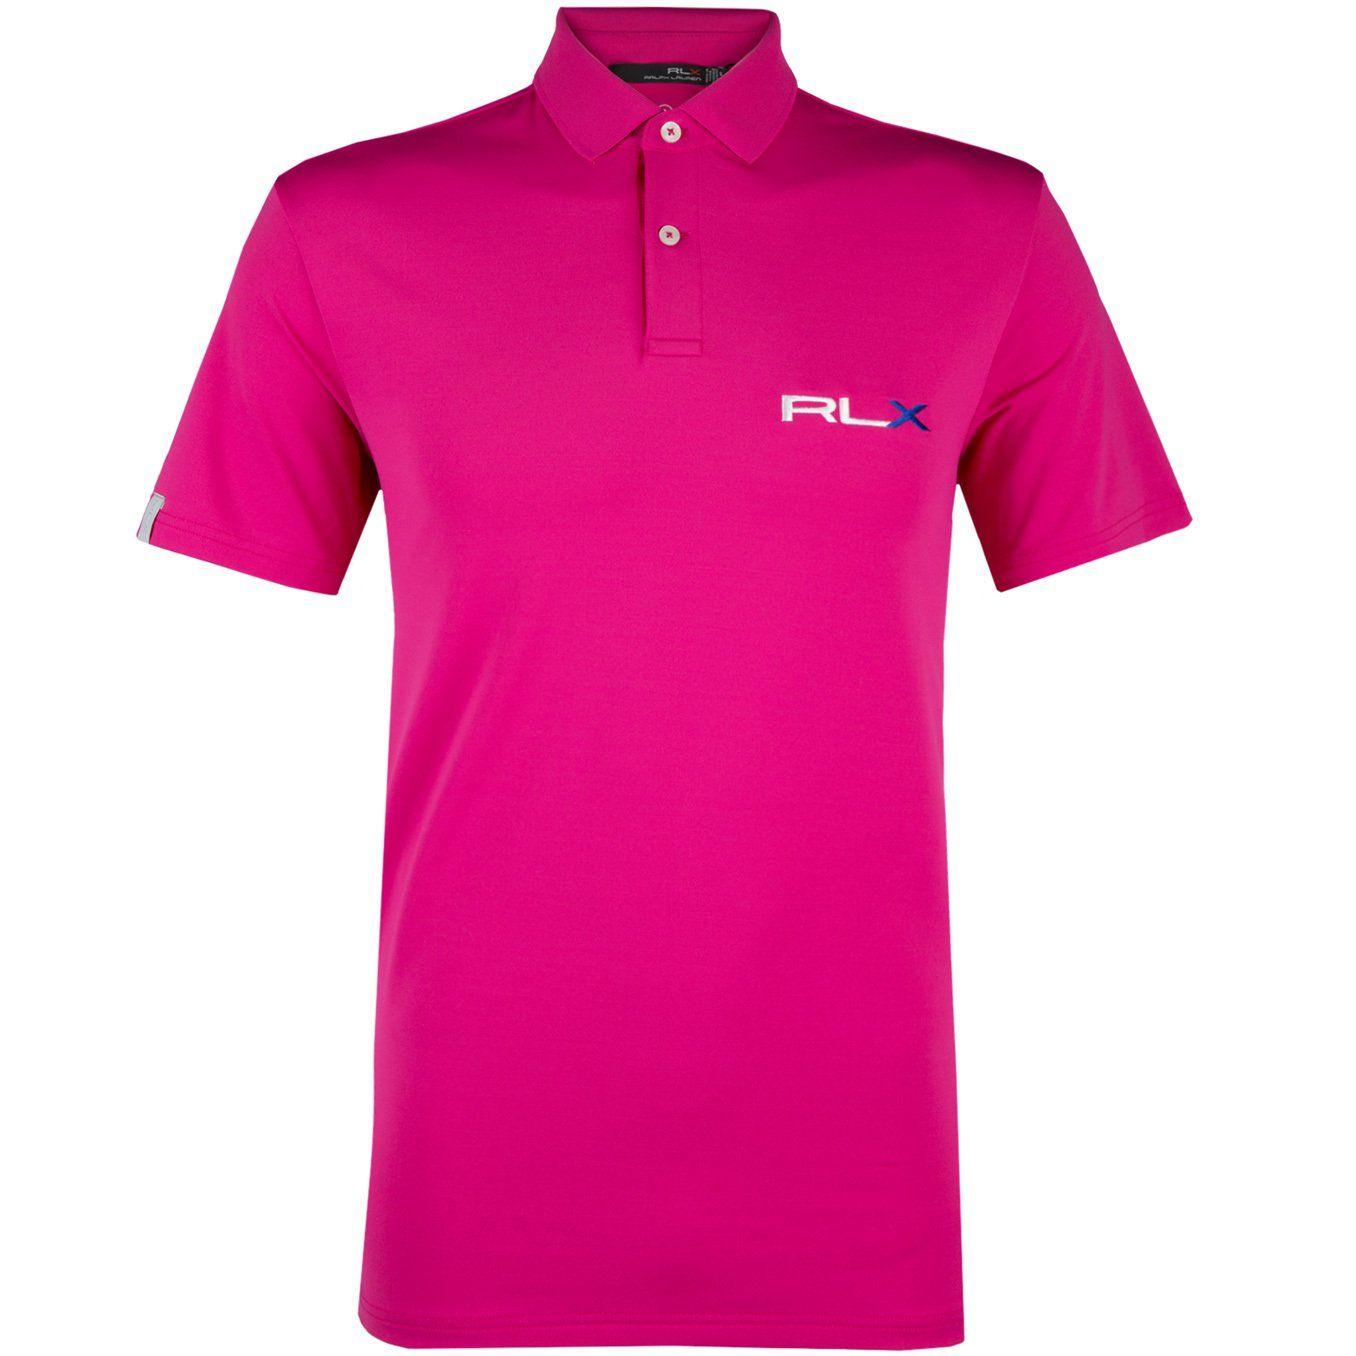 Rlx Ralph Lauren Airflow Jersey Magenta Polo Shirt Trendygolfusa